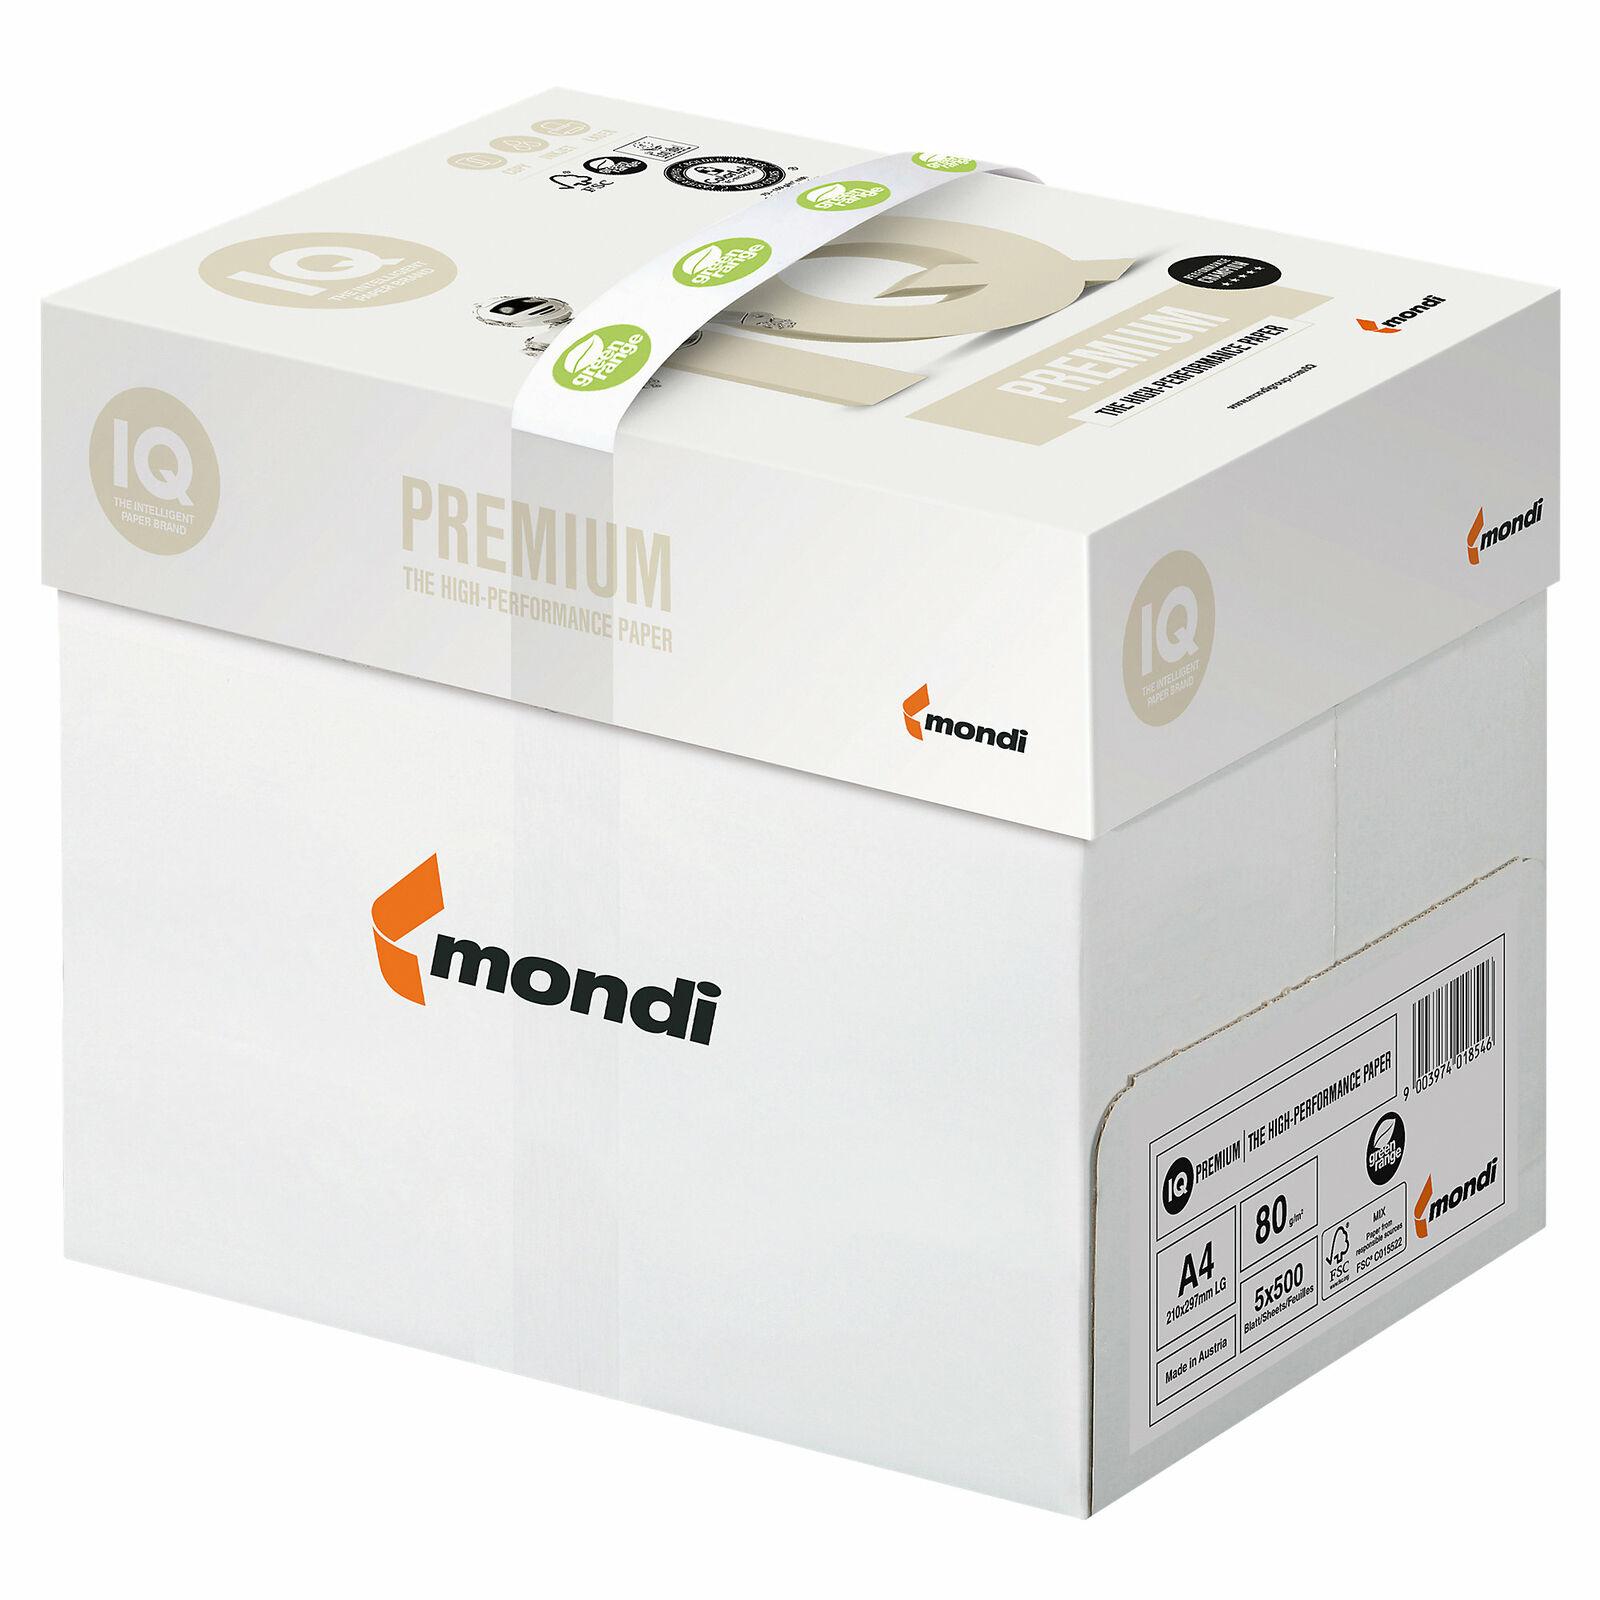 2500 Blatt Mondi IQ Premium Kopierpapier Trio-Tec DIN-A4, 80g/m²